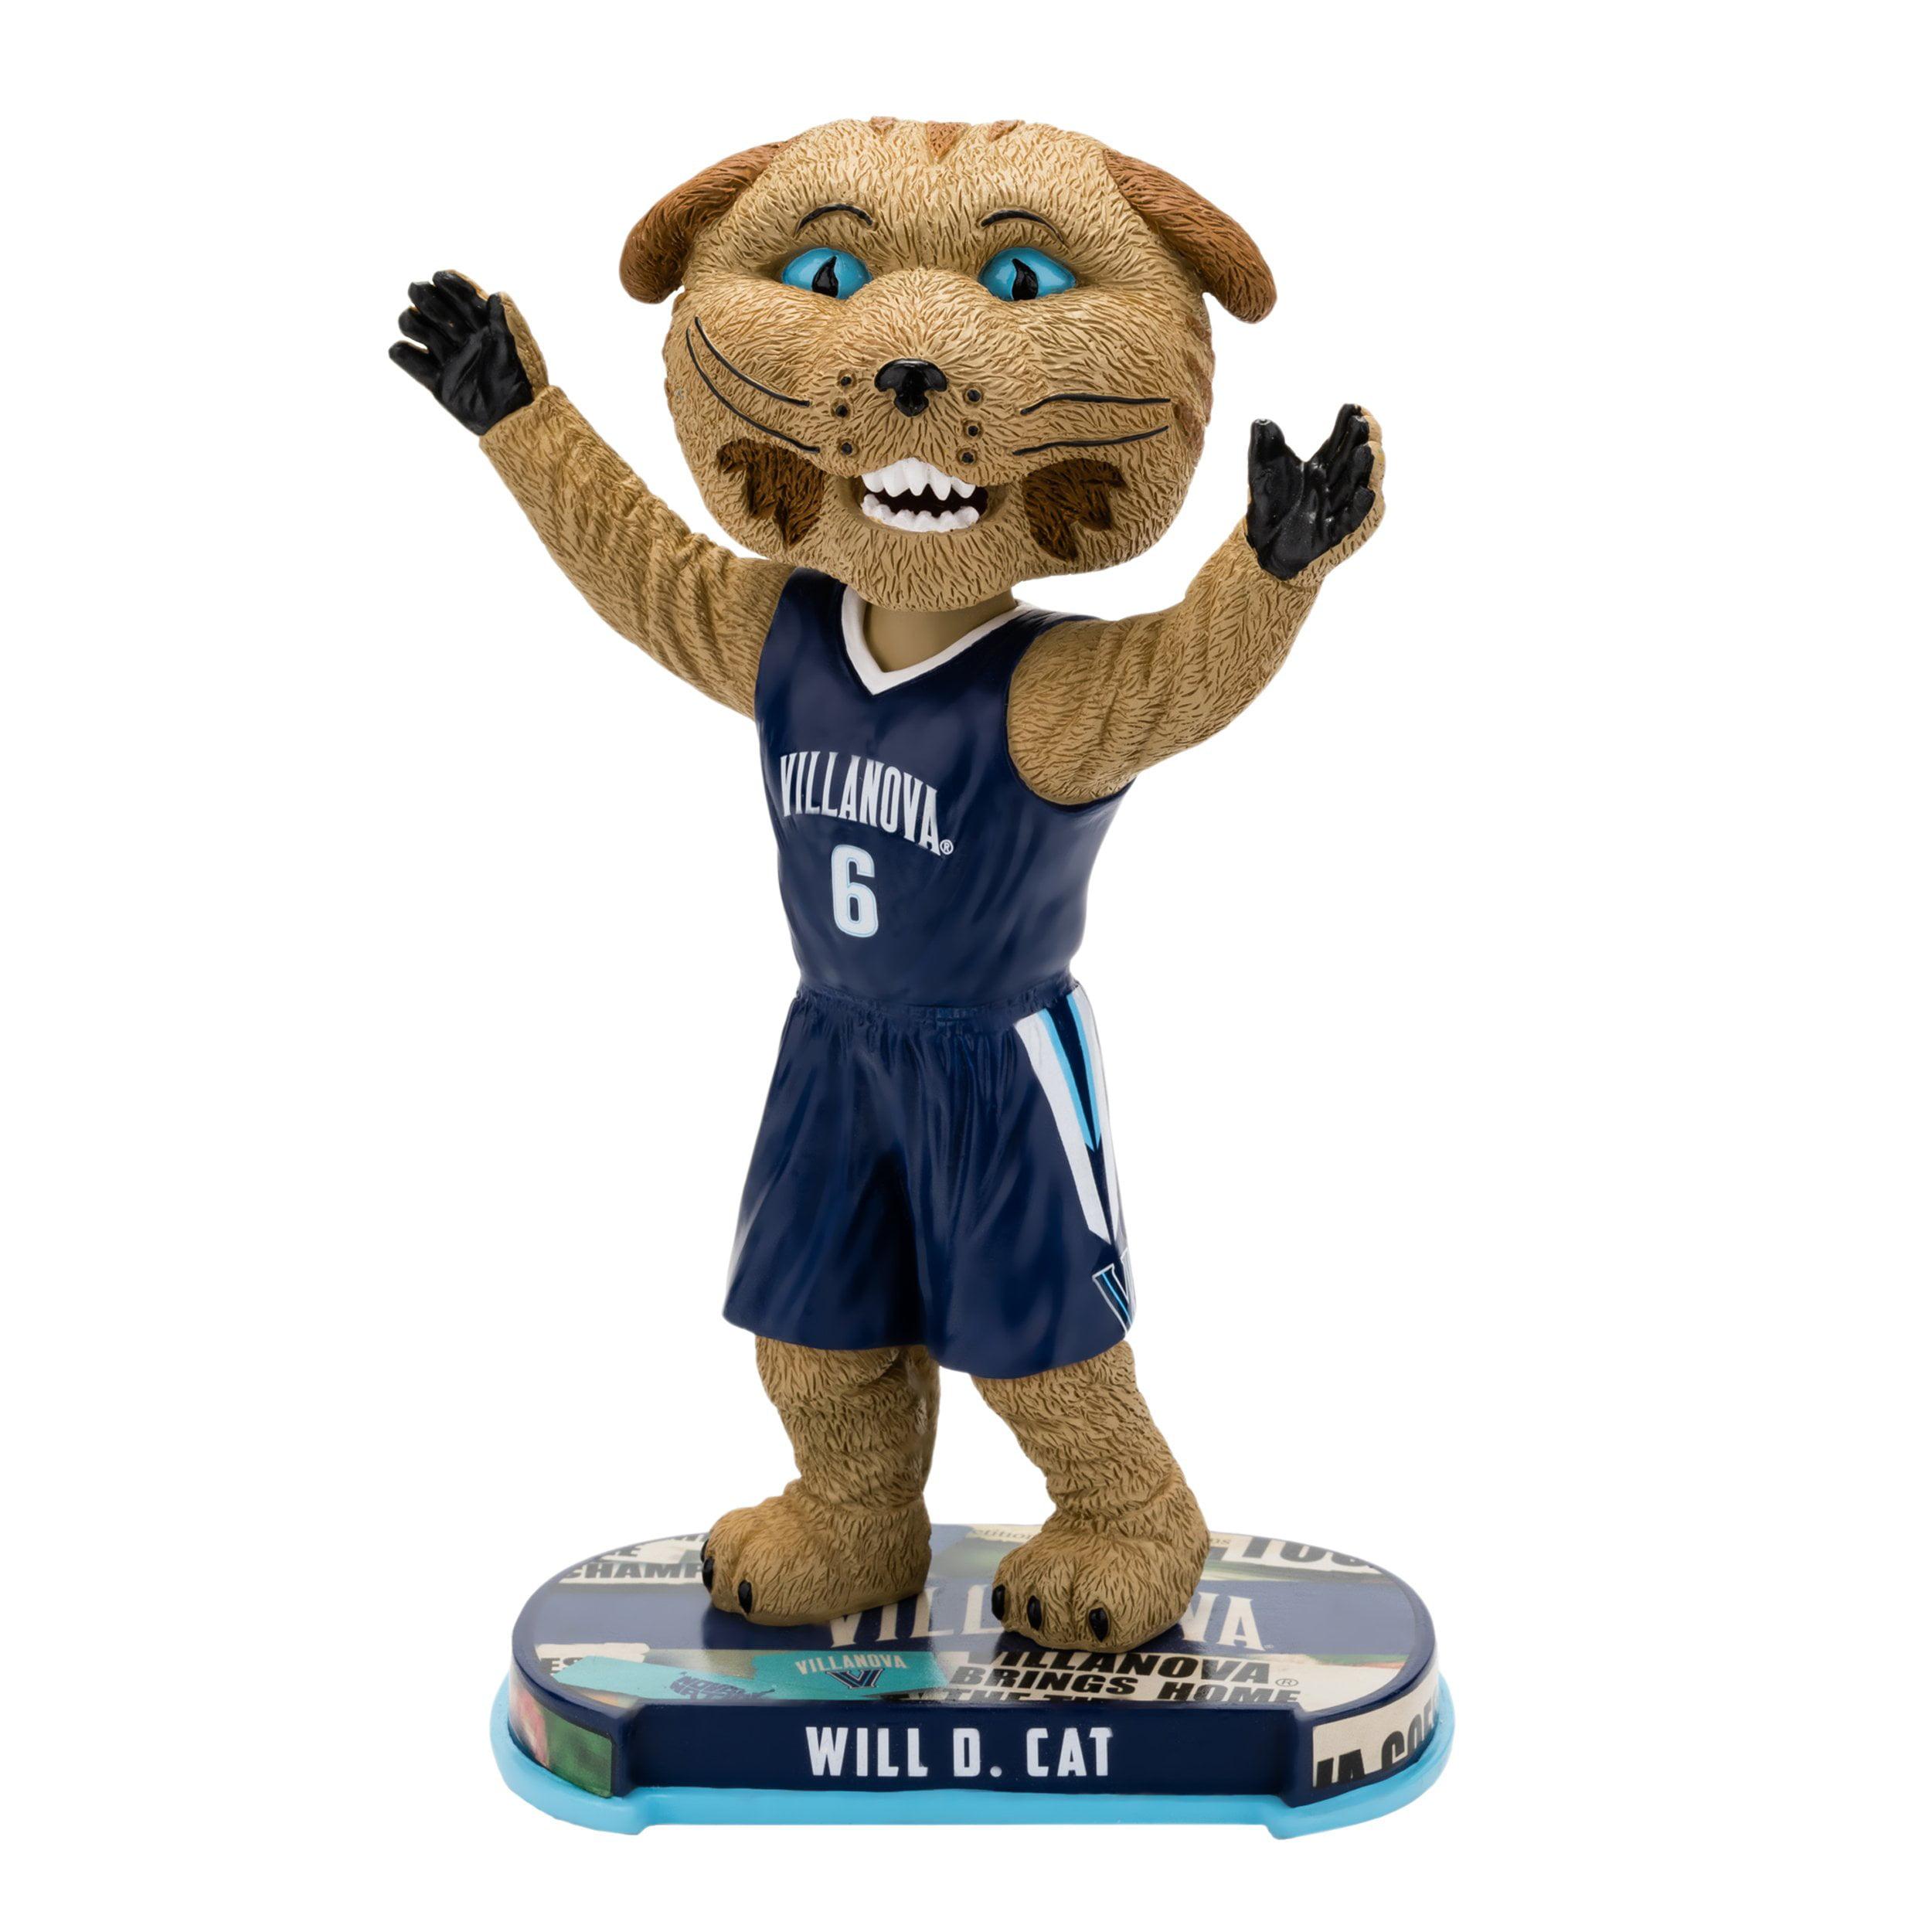 Villanova Wildcats Mascot Villanova Wildcats Headline Bobblehead NCAA